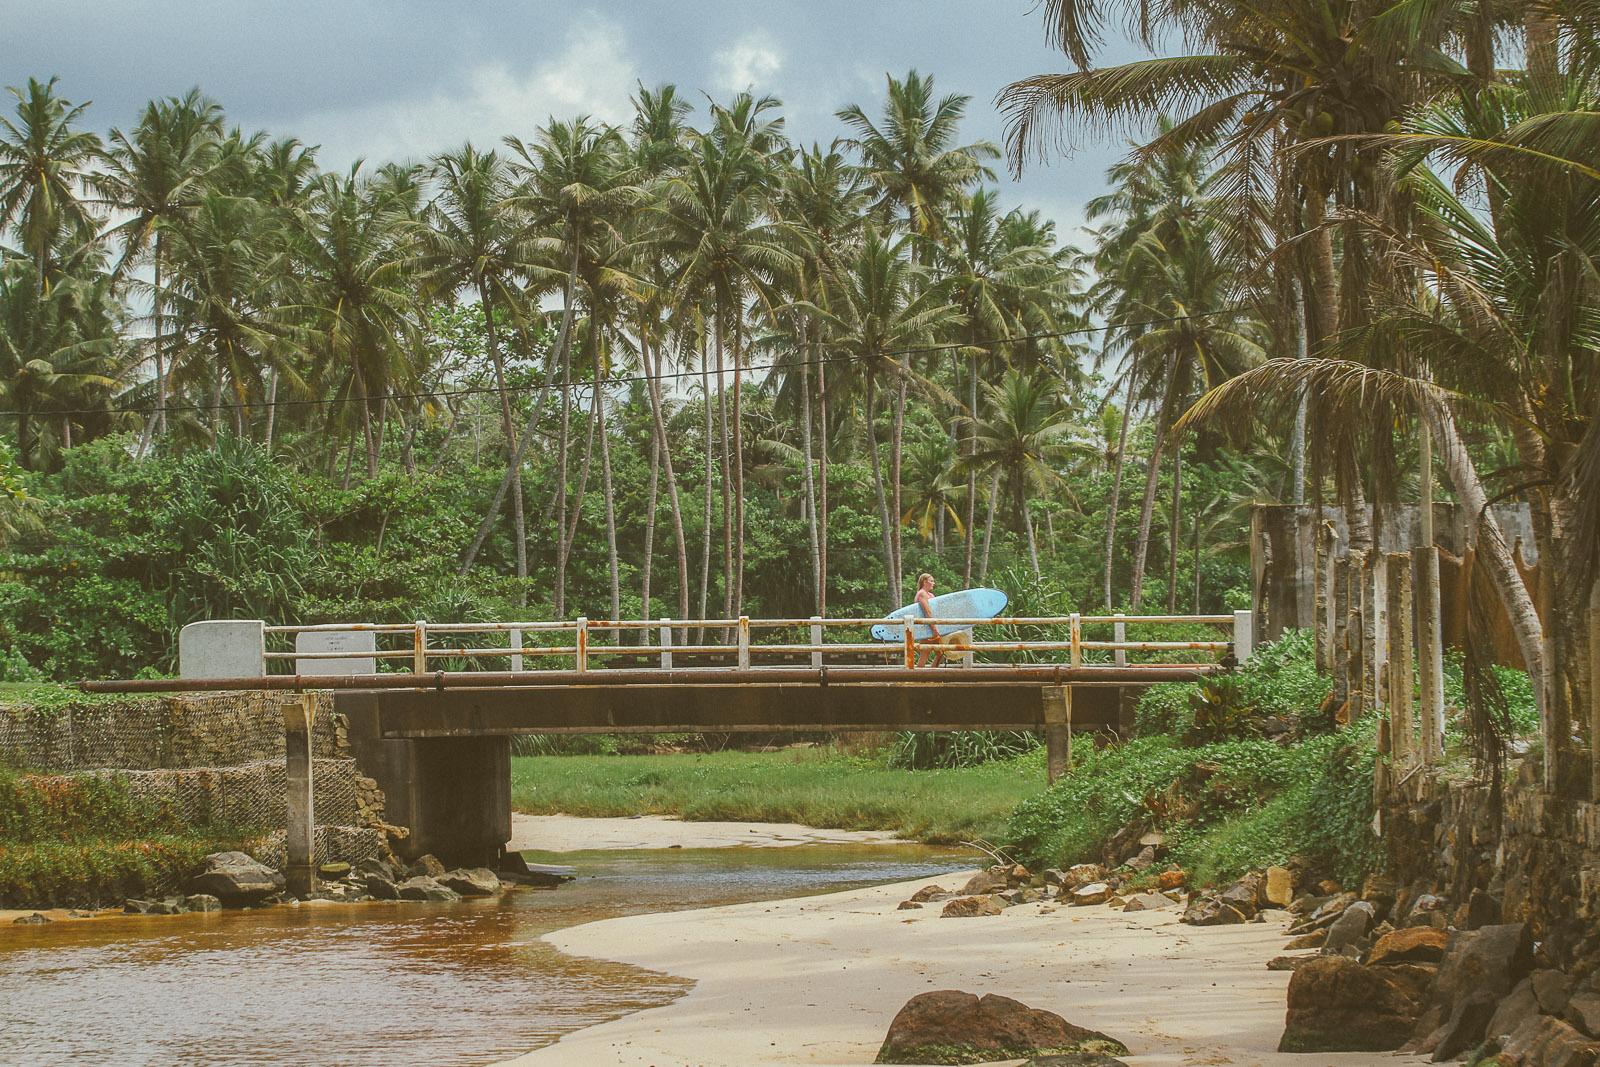 Sri Lanka-Lazy Left-Rams-Midigama-Surfing-Surf-Wave-Pointbreak-Longboard-Sunshinestories-IMG_3845